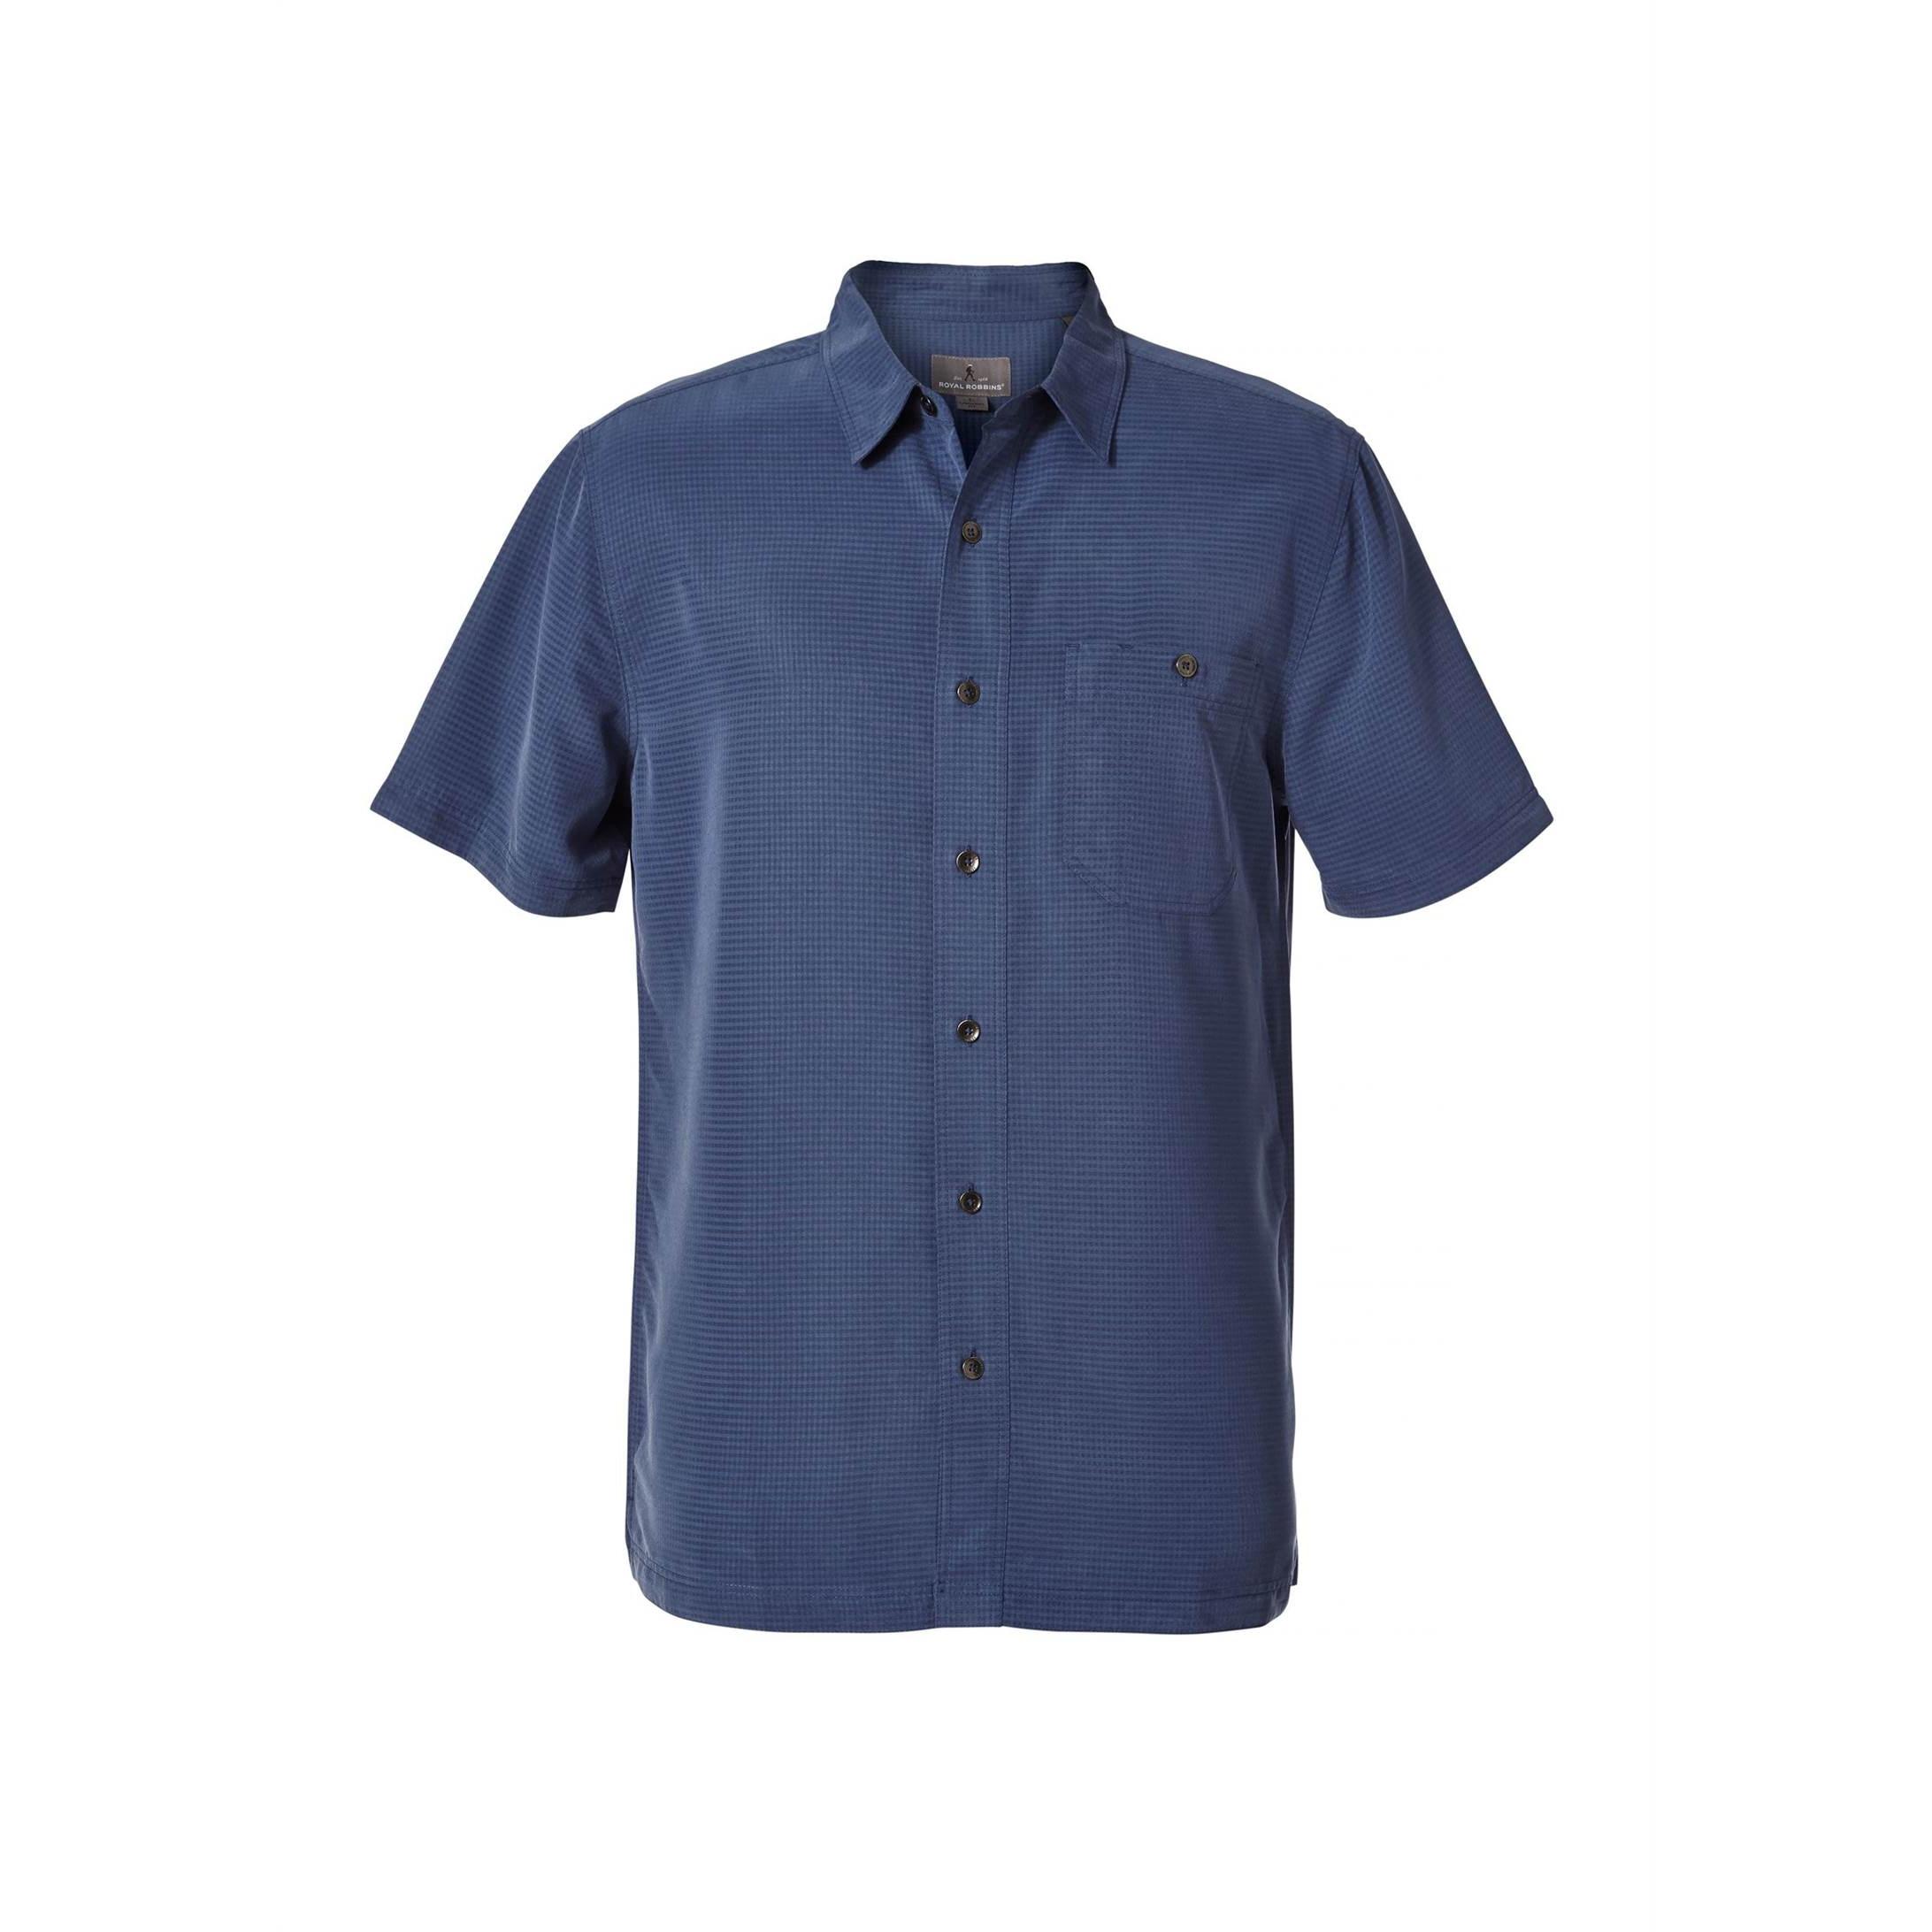 Mojave Pucker Dry Short Sleeve - Men's